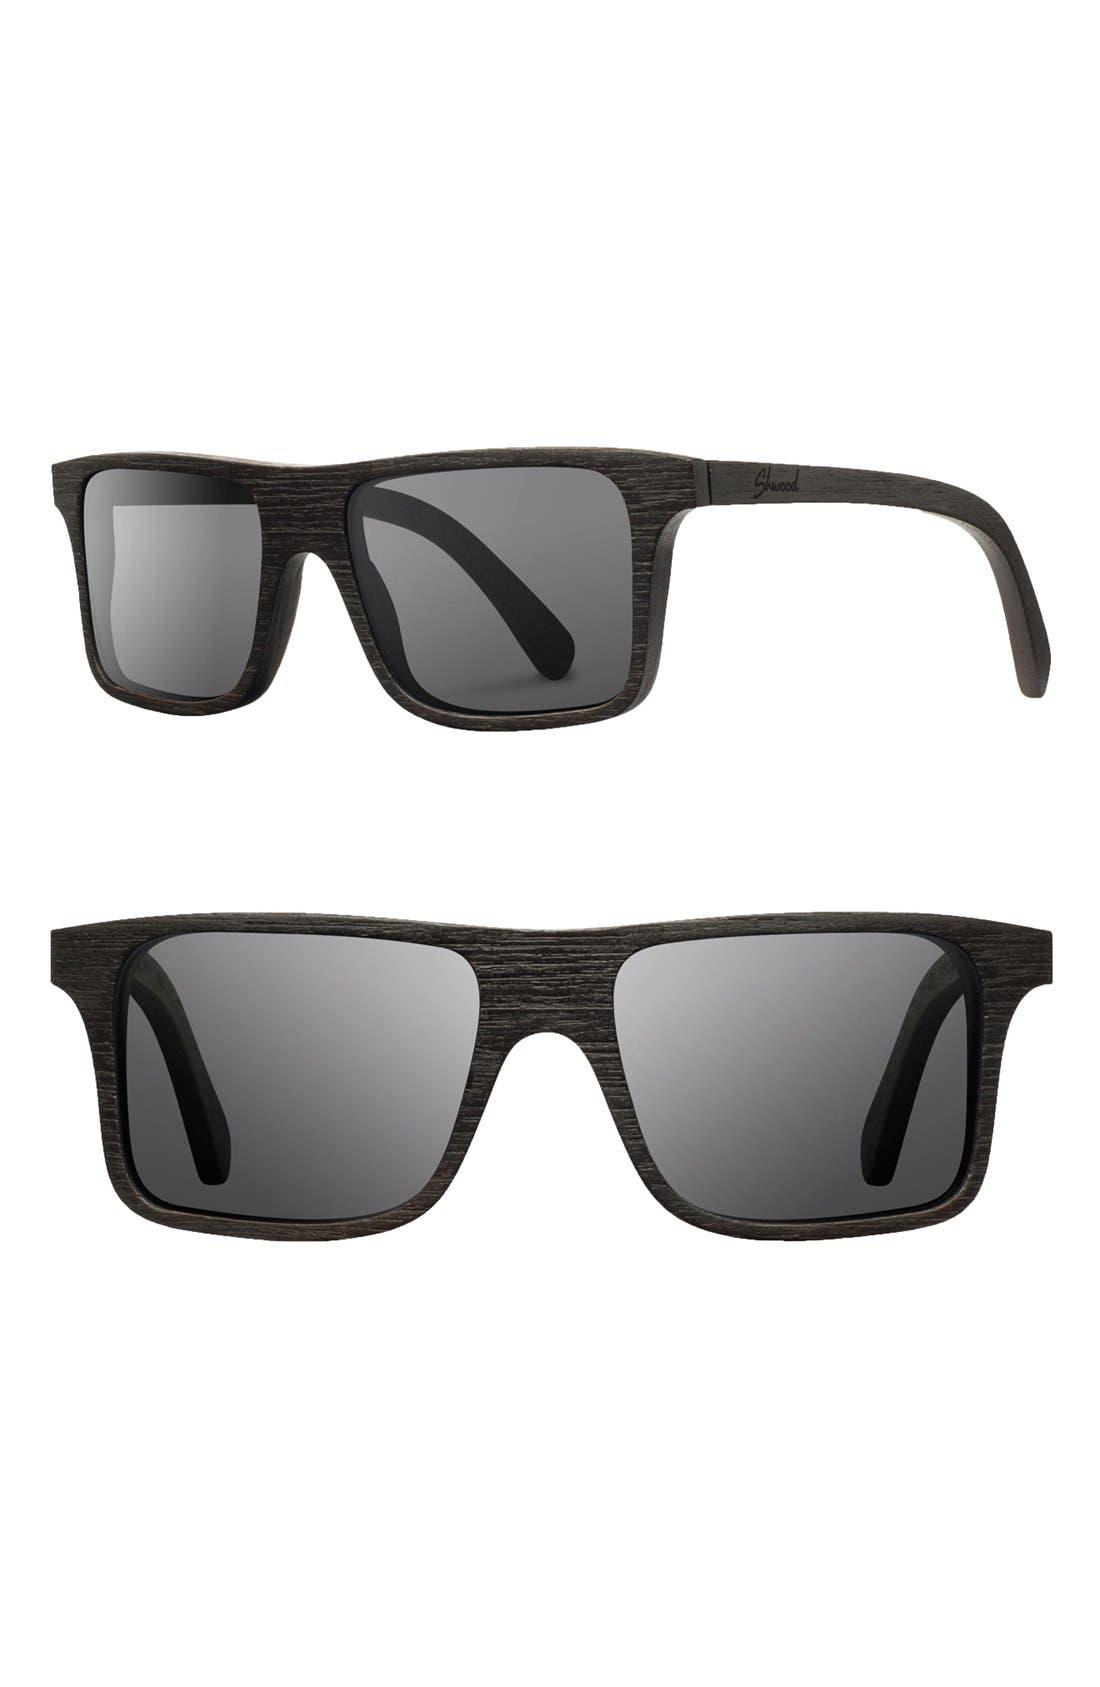 Alternate Image 1 Selected - Shwood 'Govy' 53mm Sunglasses